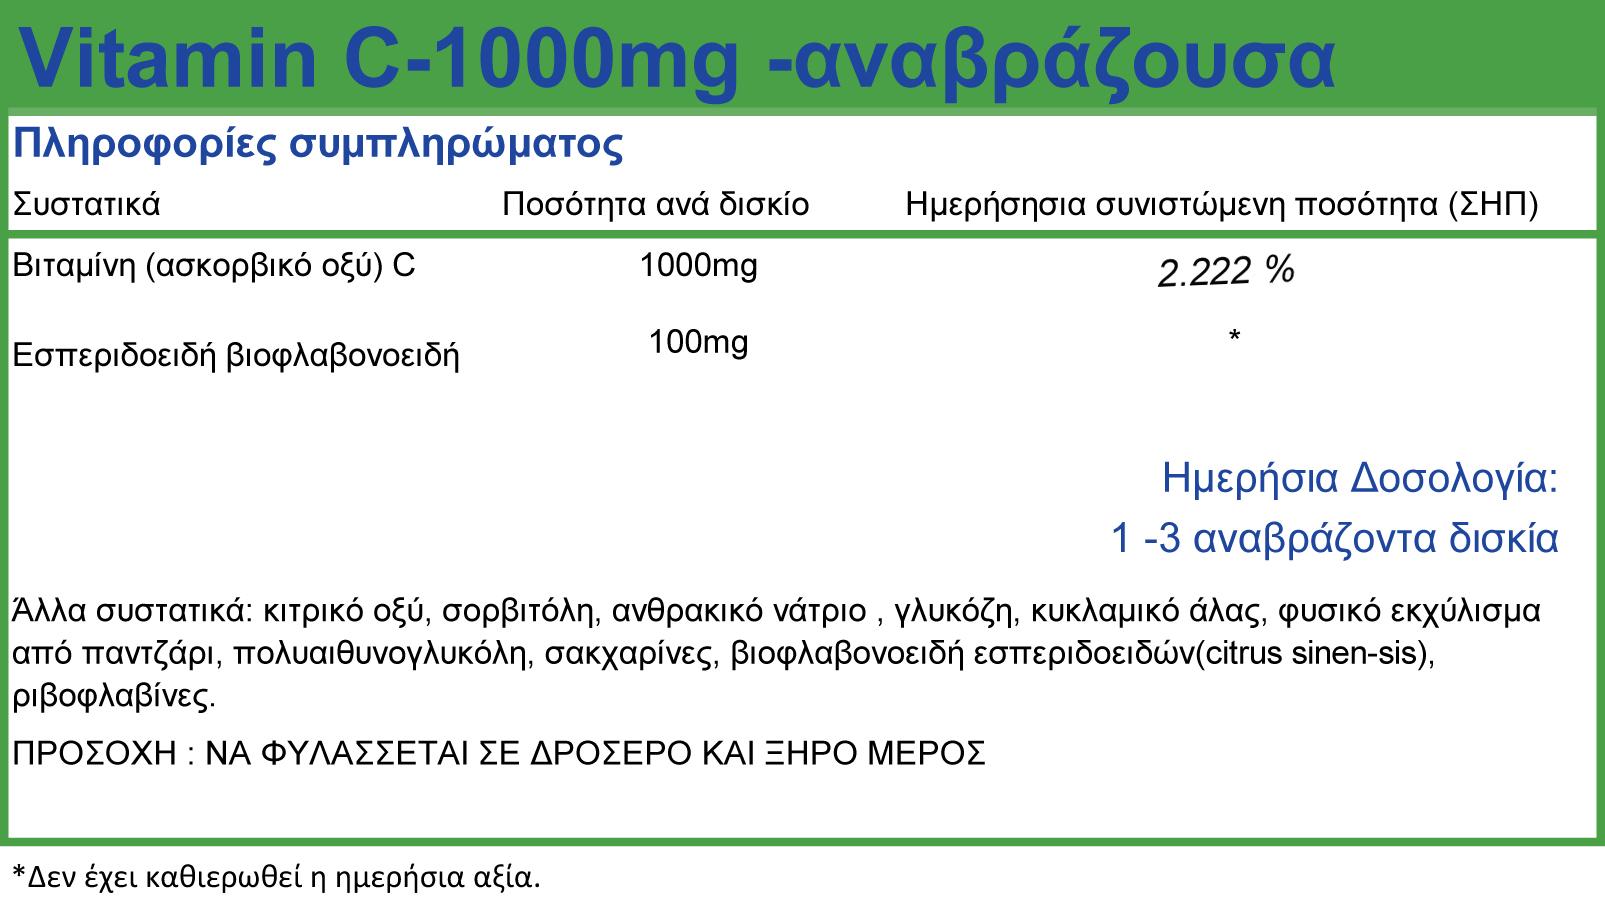 vitamin c nutrition image